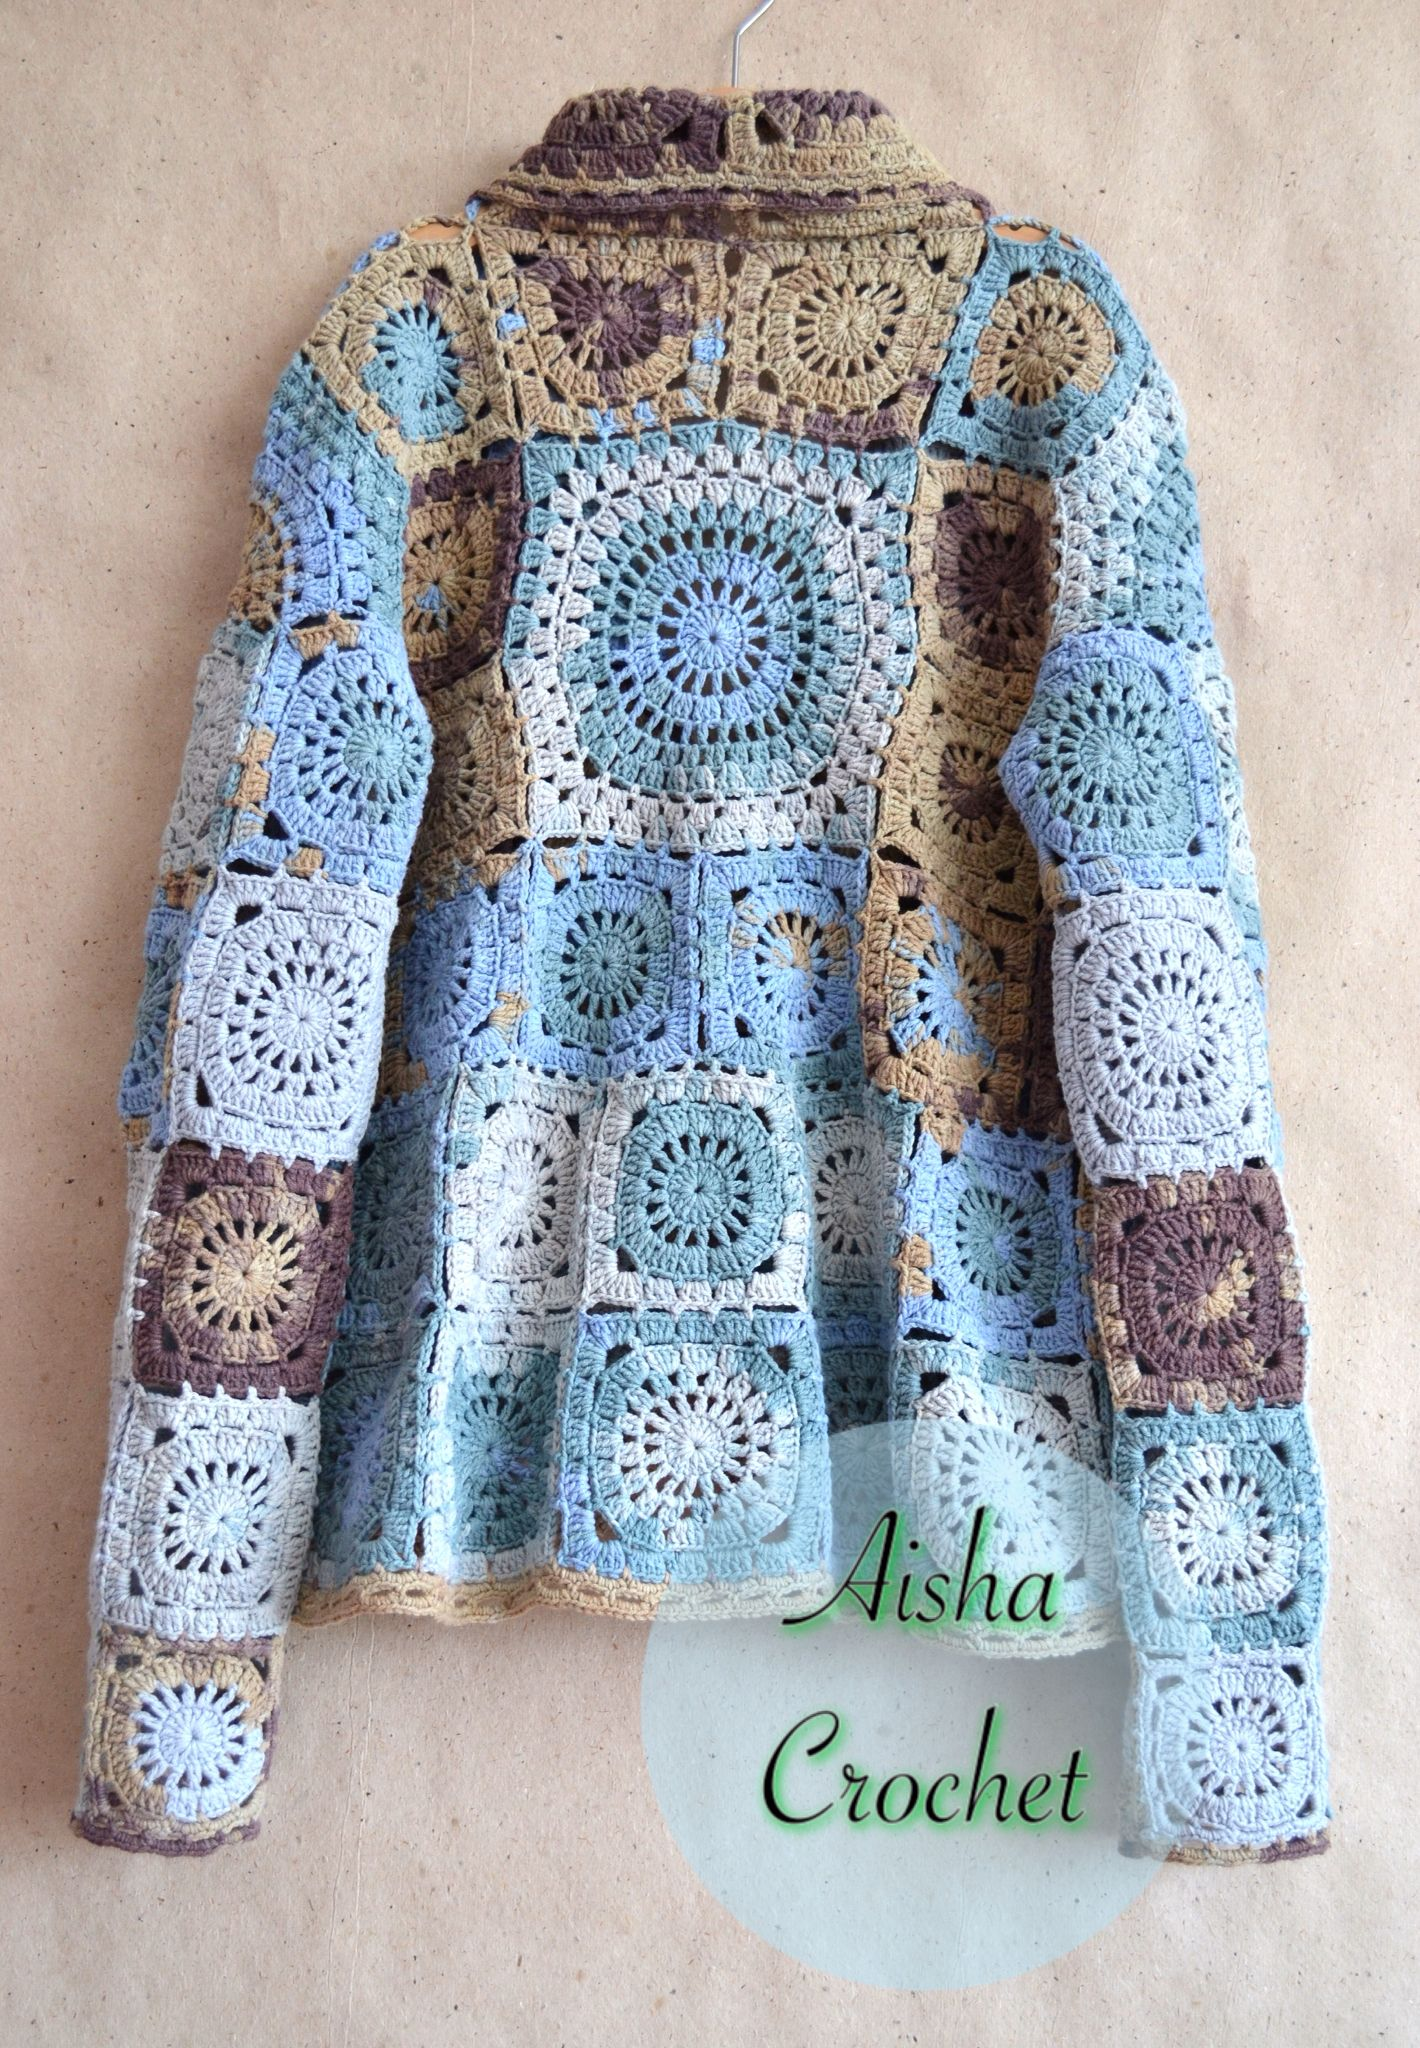 Boho jacket Sicilia by Aisha Crochet | Aisha Crochet | Pinterest ...